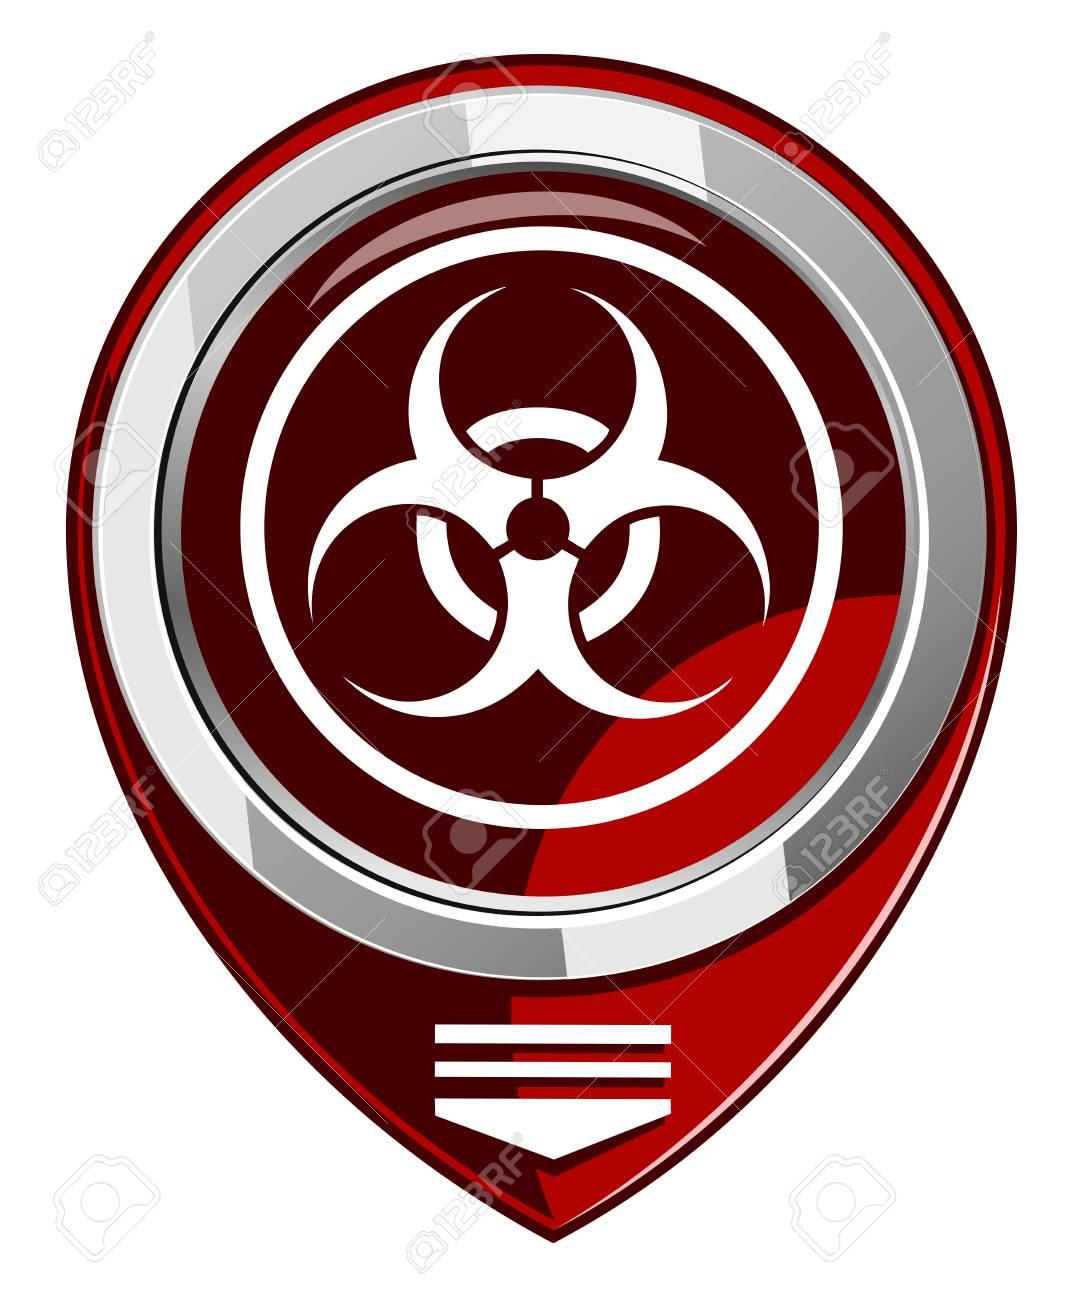 Warning symbol biohazard red map pointer Stock Vector - 22458032